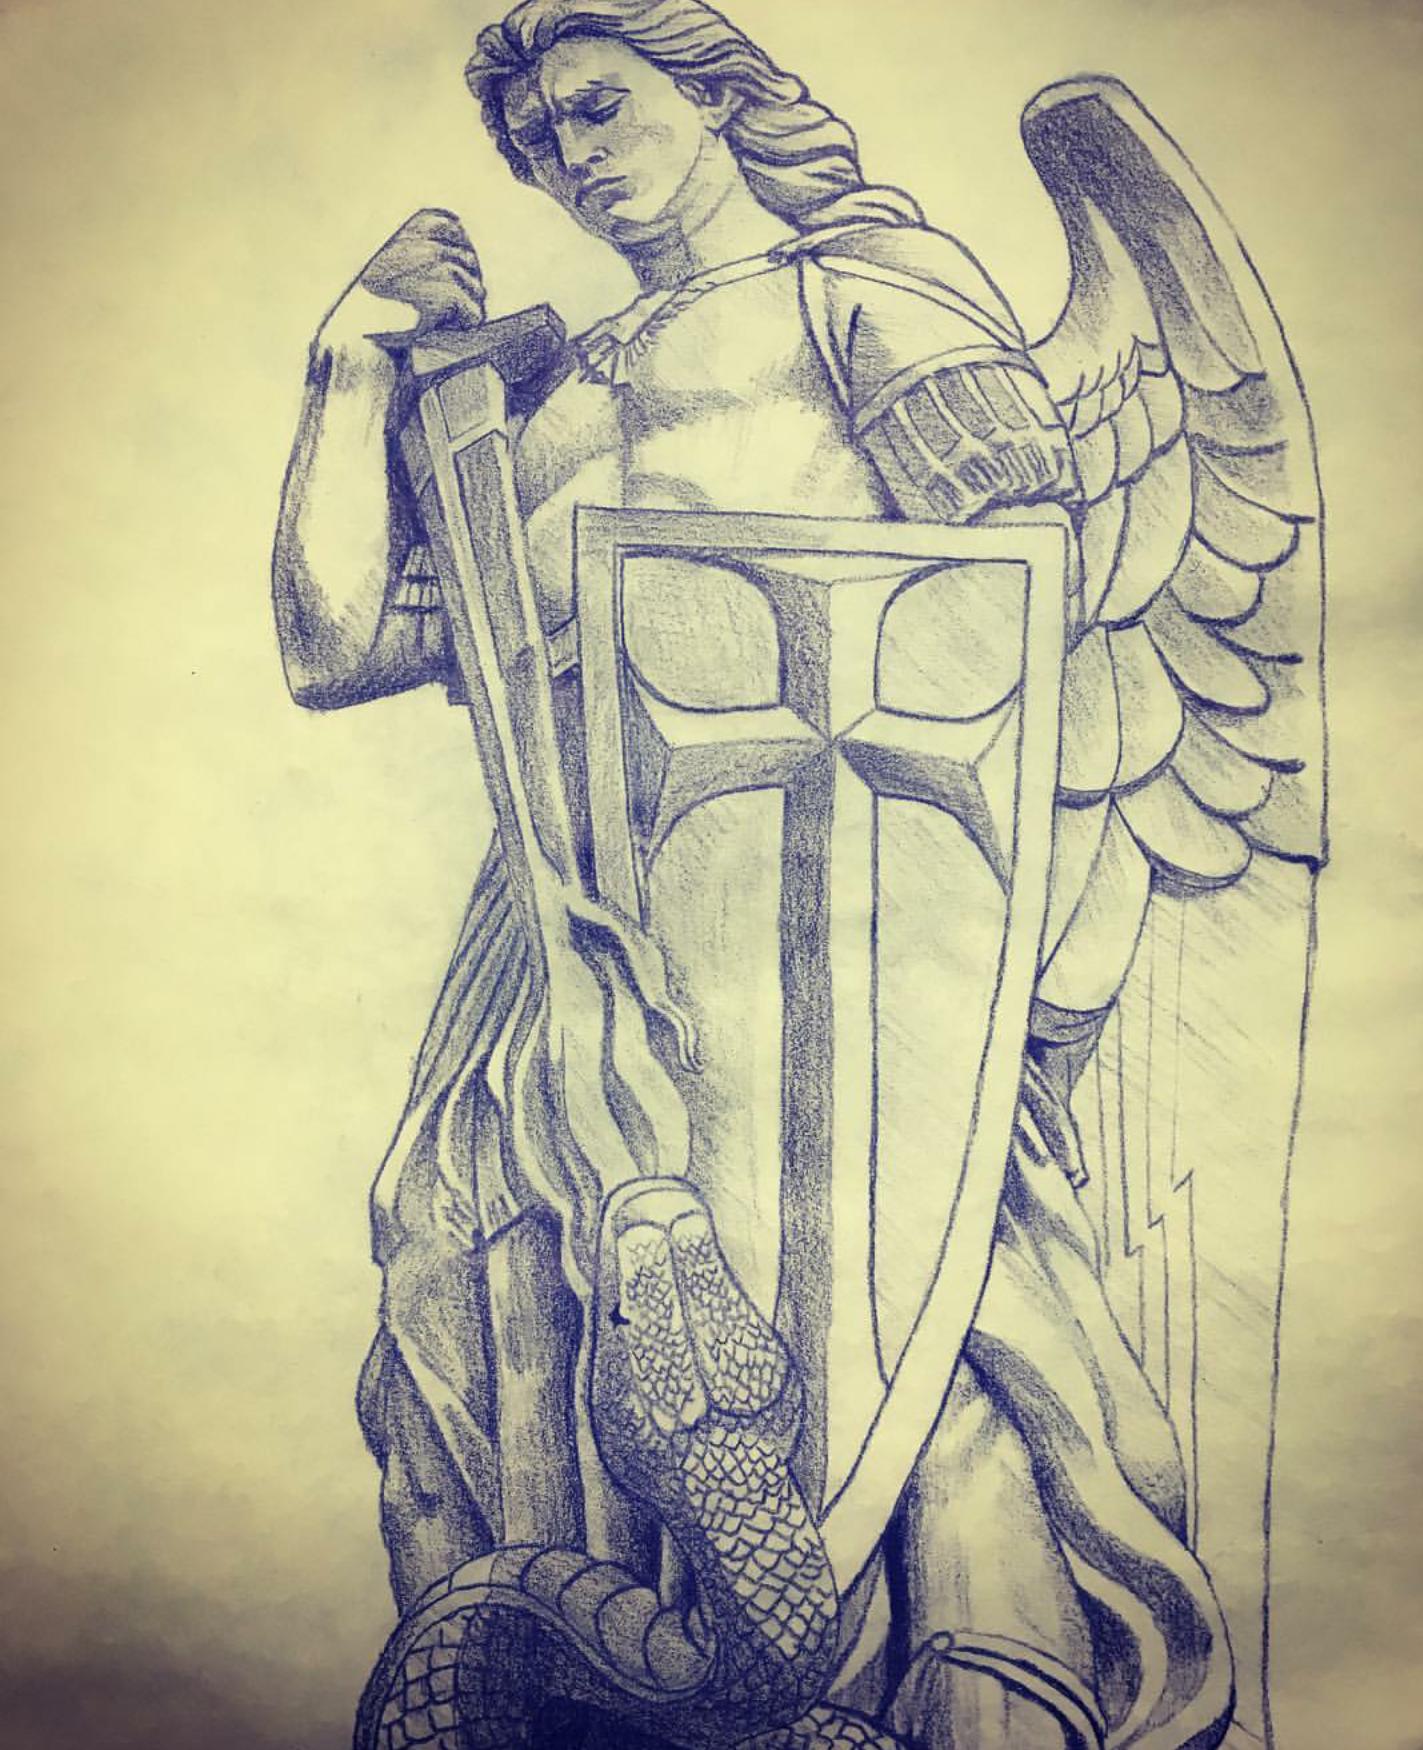 Saint jude or saint Michael or a chi rho - Tattoo.com